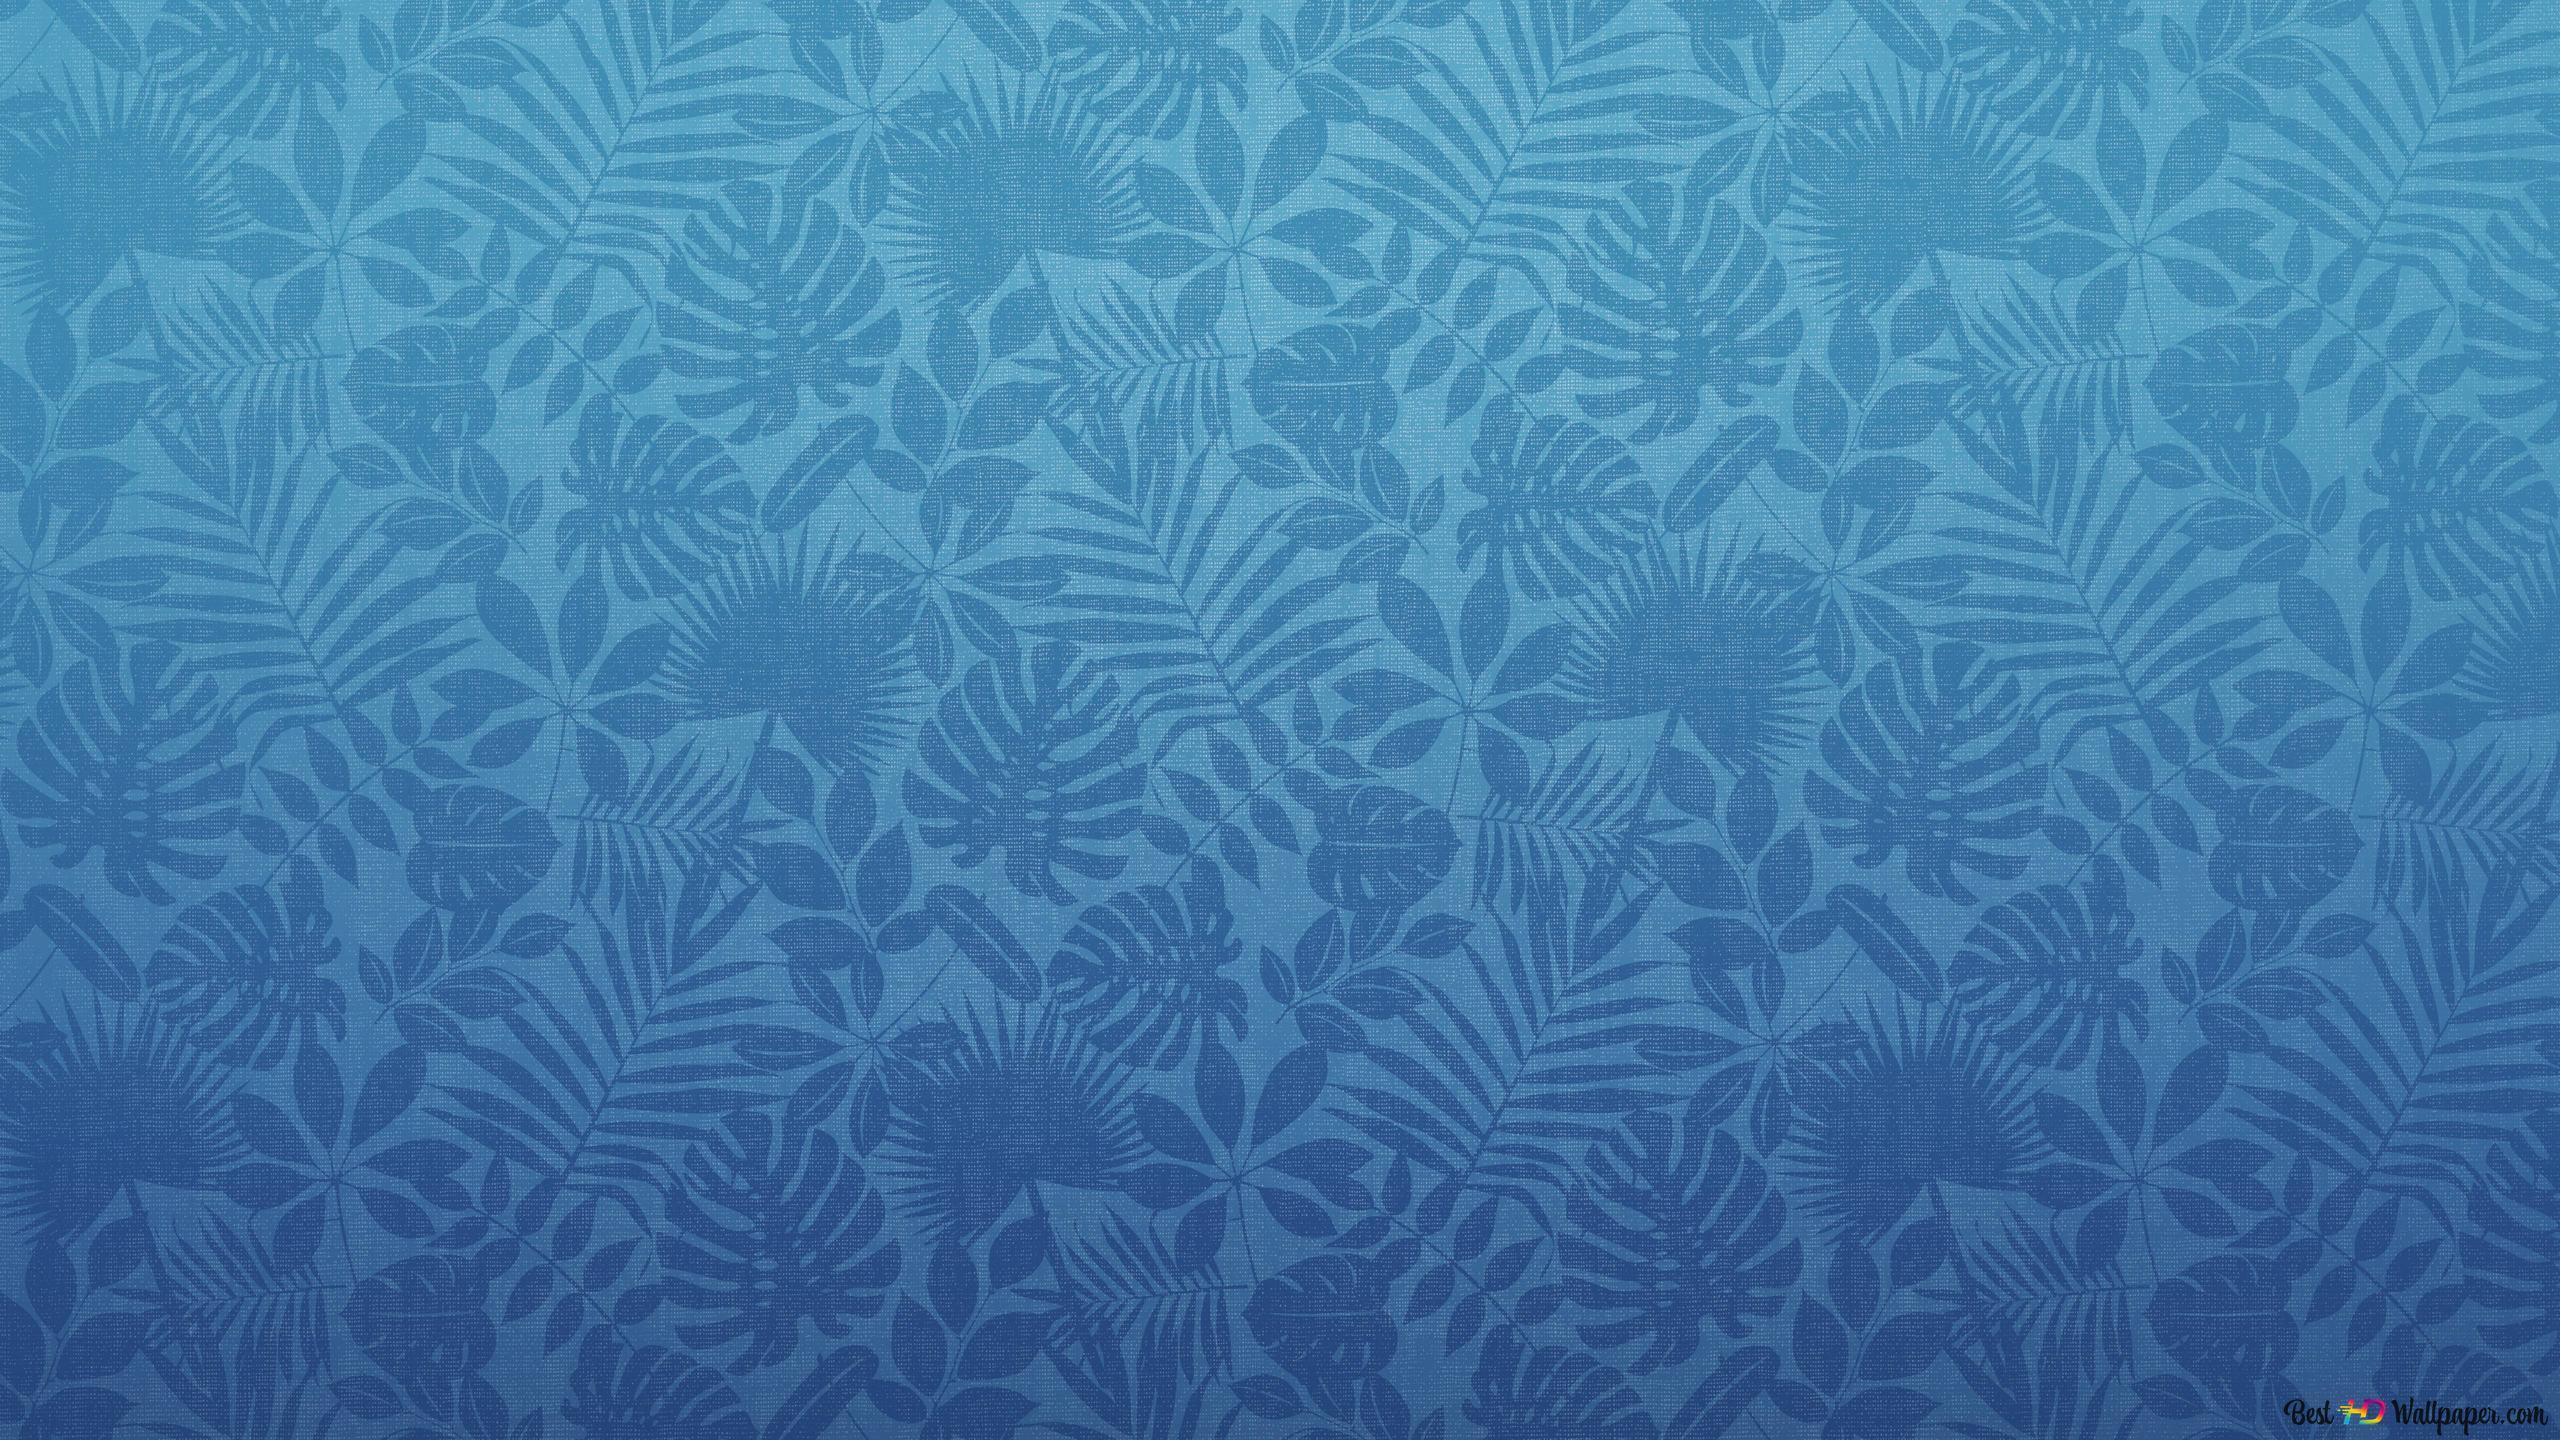 Motif De Feuille Bleu Foncé Sur Fond Bleu Dégradé Hd Fond D